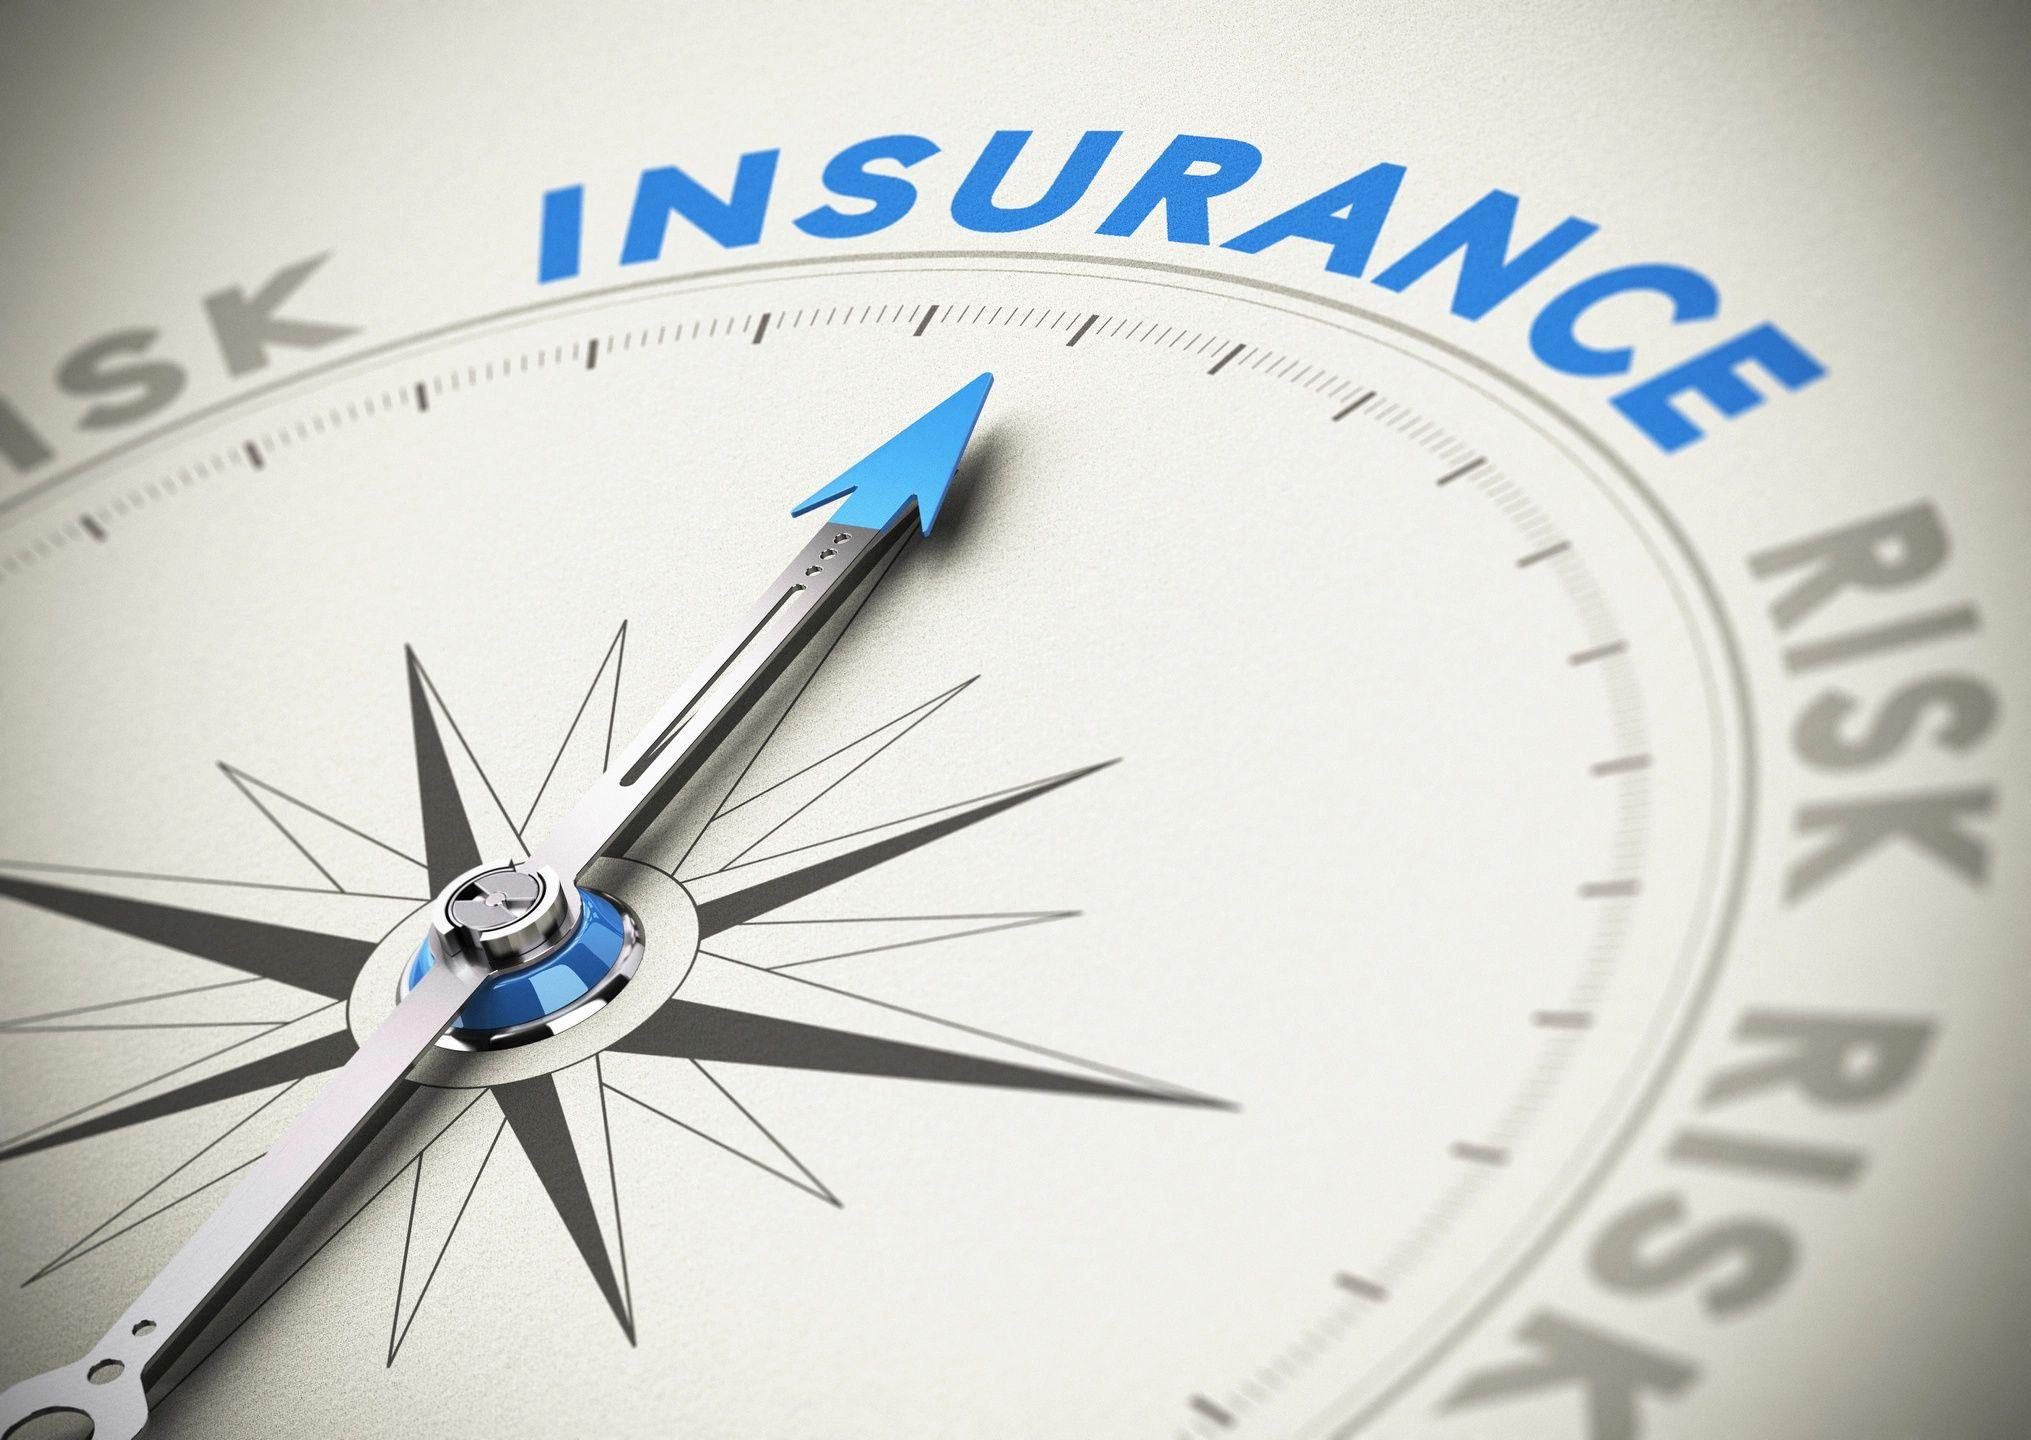 Truguard Insurance Solutions, Inc